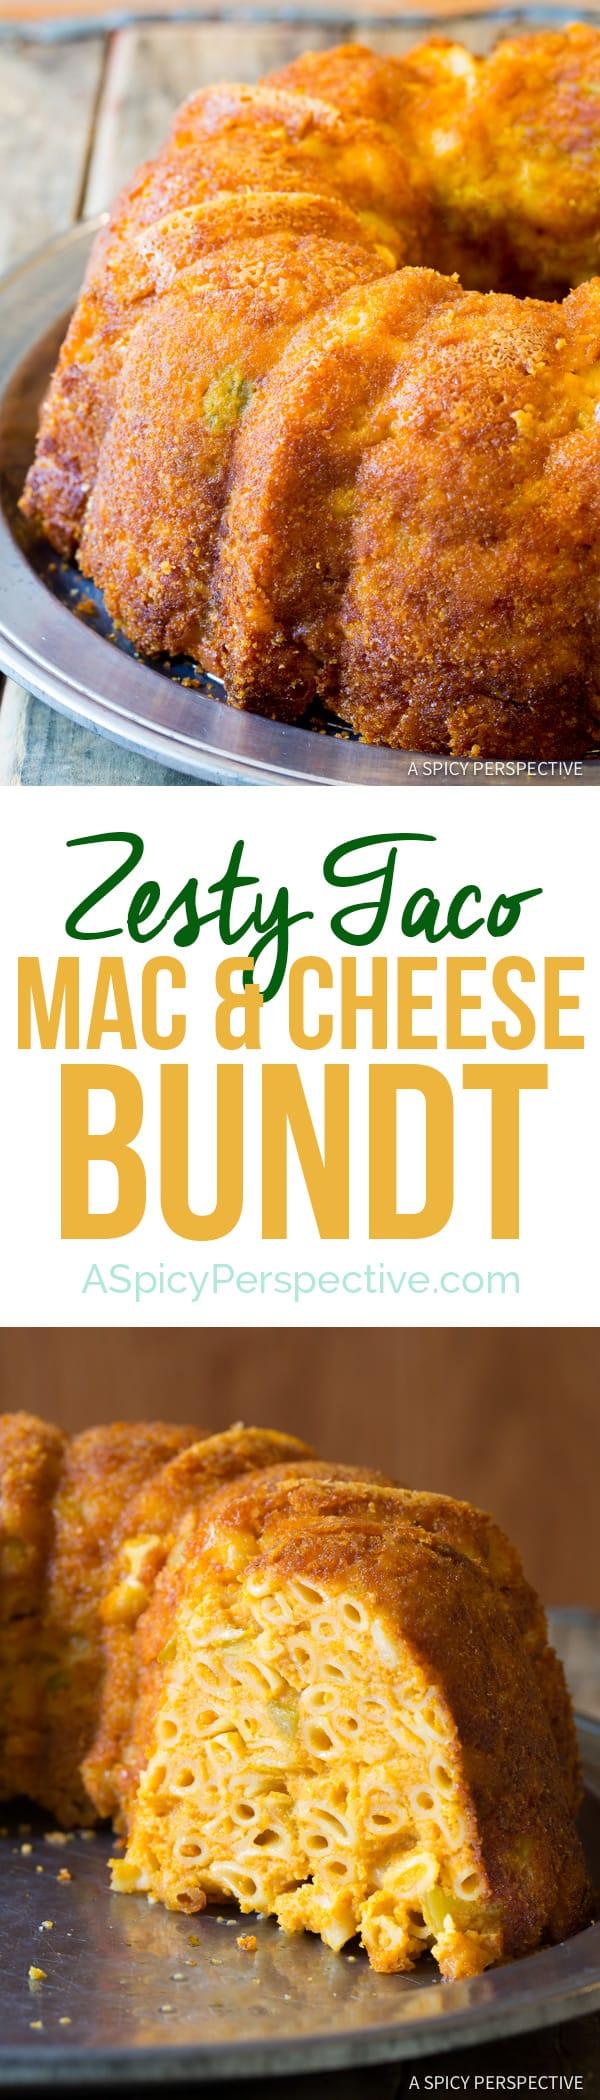 Best Taco Mac and Cheese Bundt Recipe | ASpicyPerspective.com